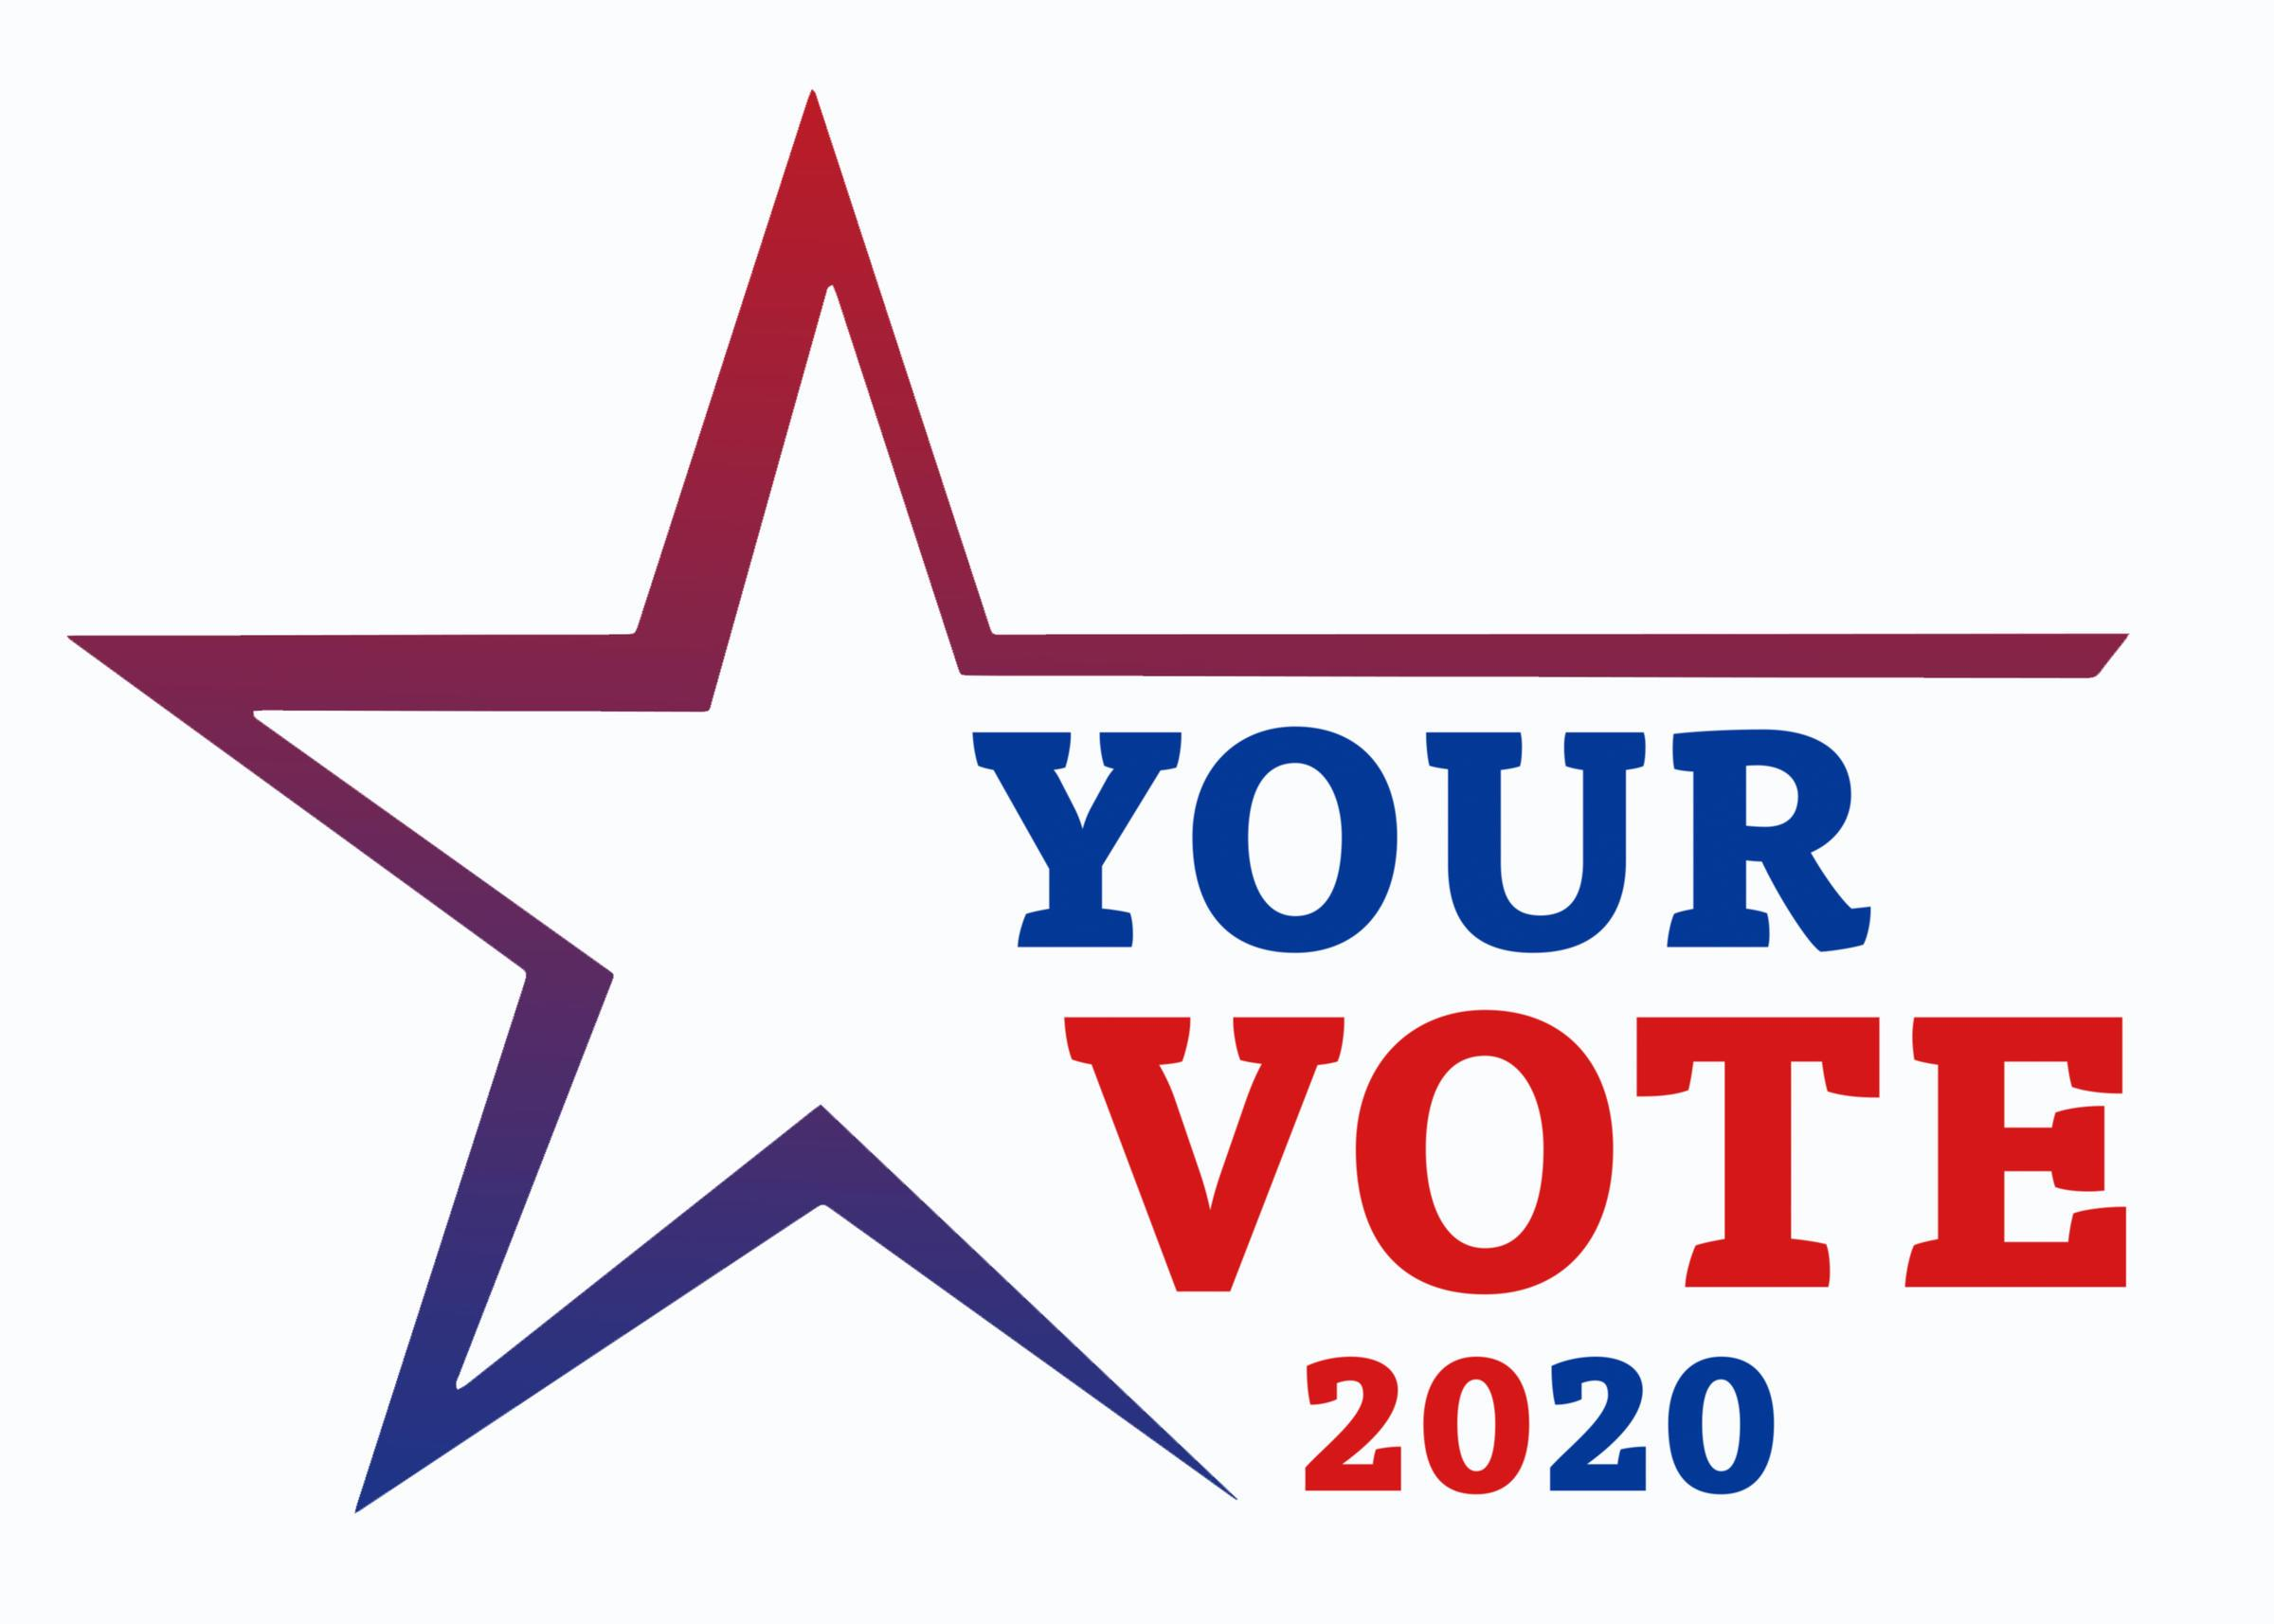 your_vote_2020_logo.jpg